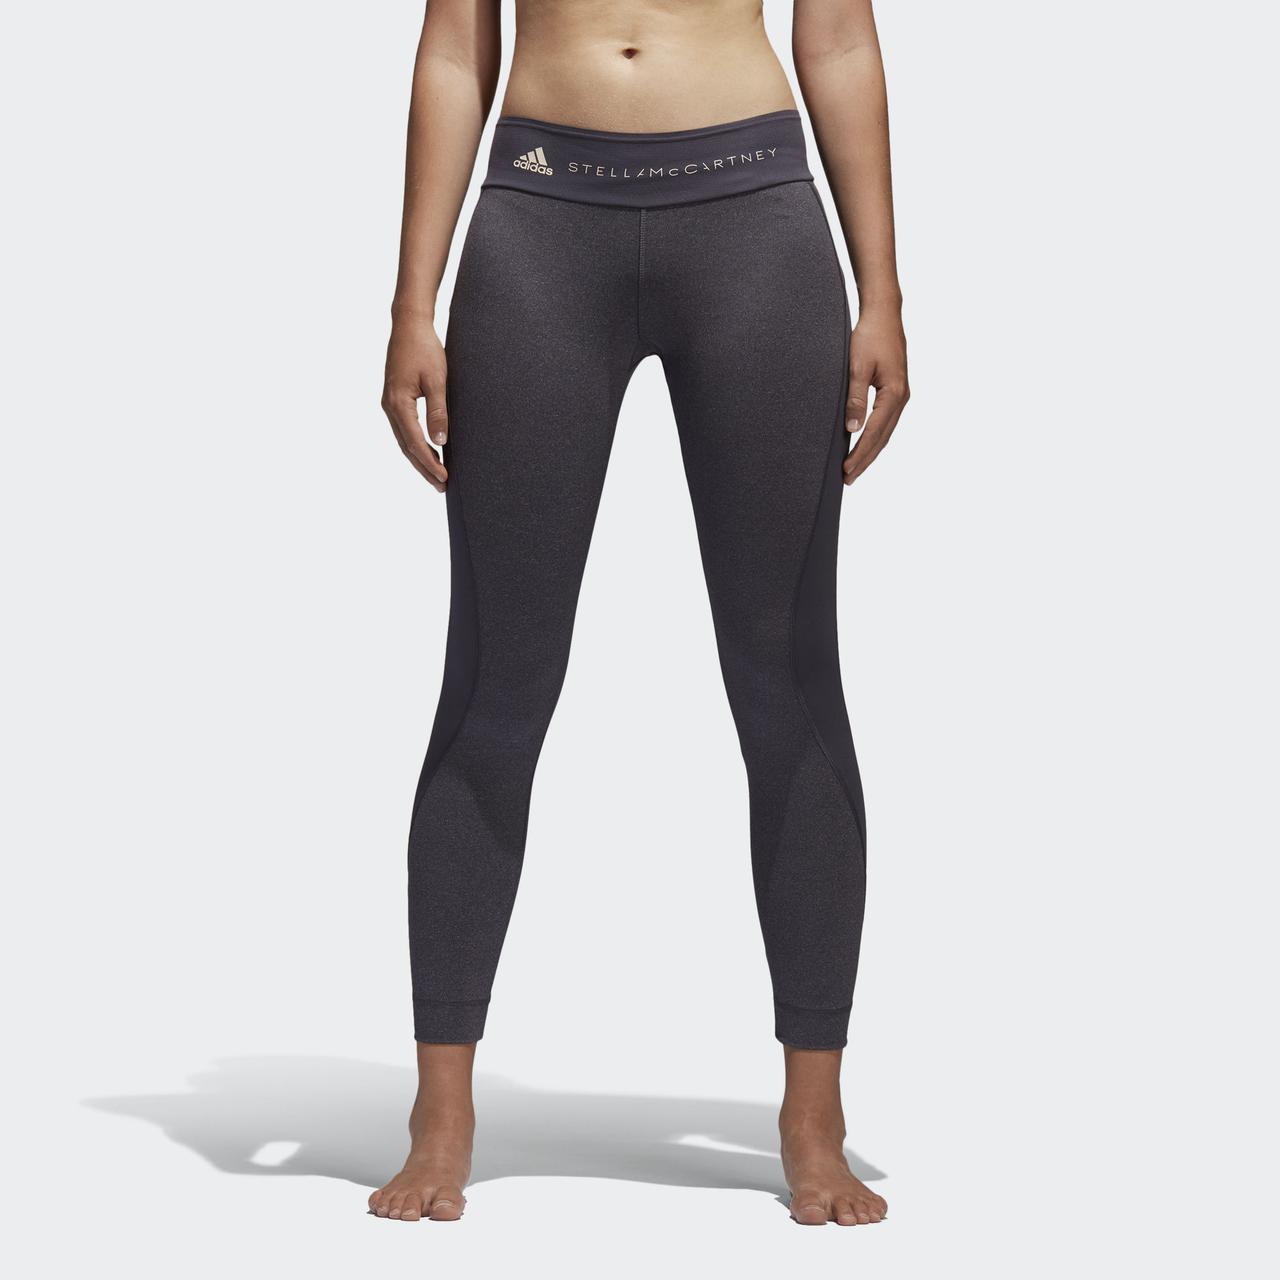 Леггинсы Yoga Ultimate Comfort